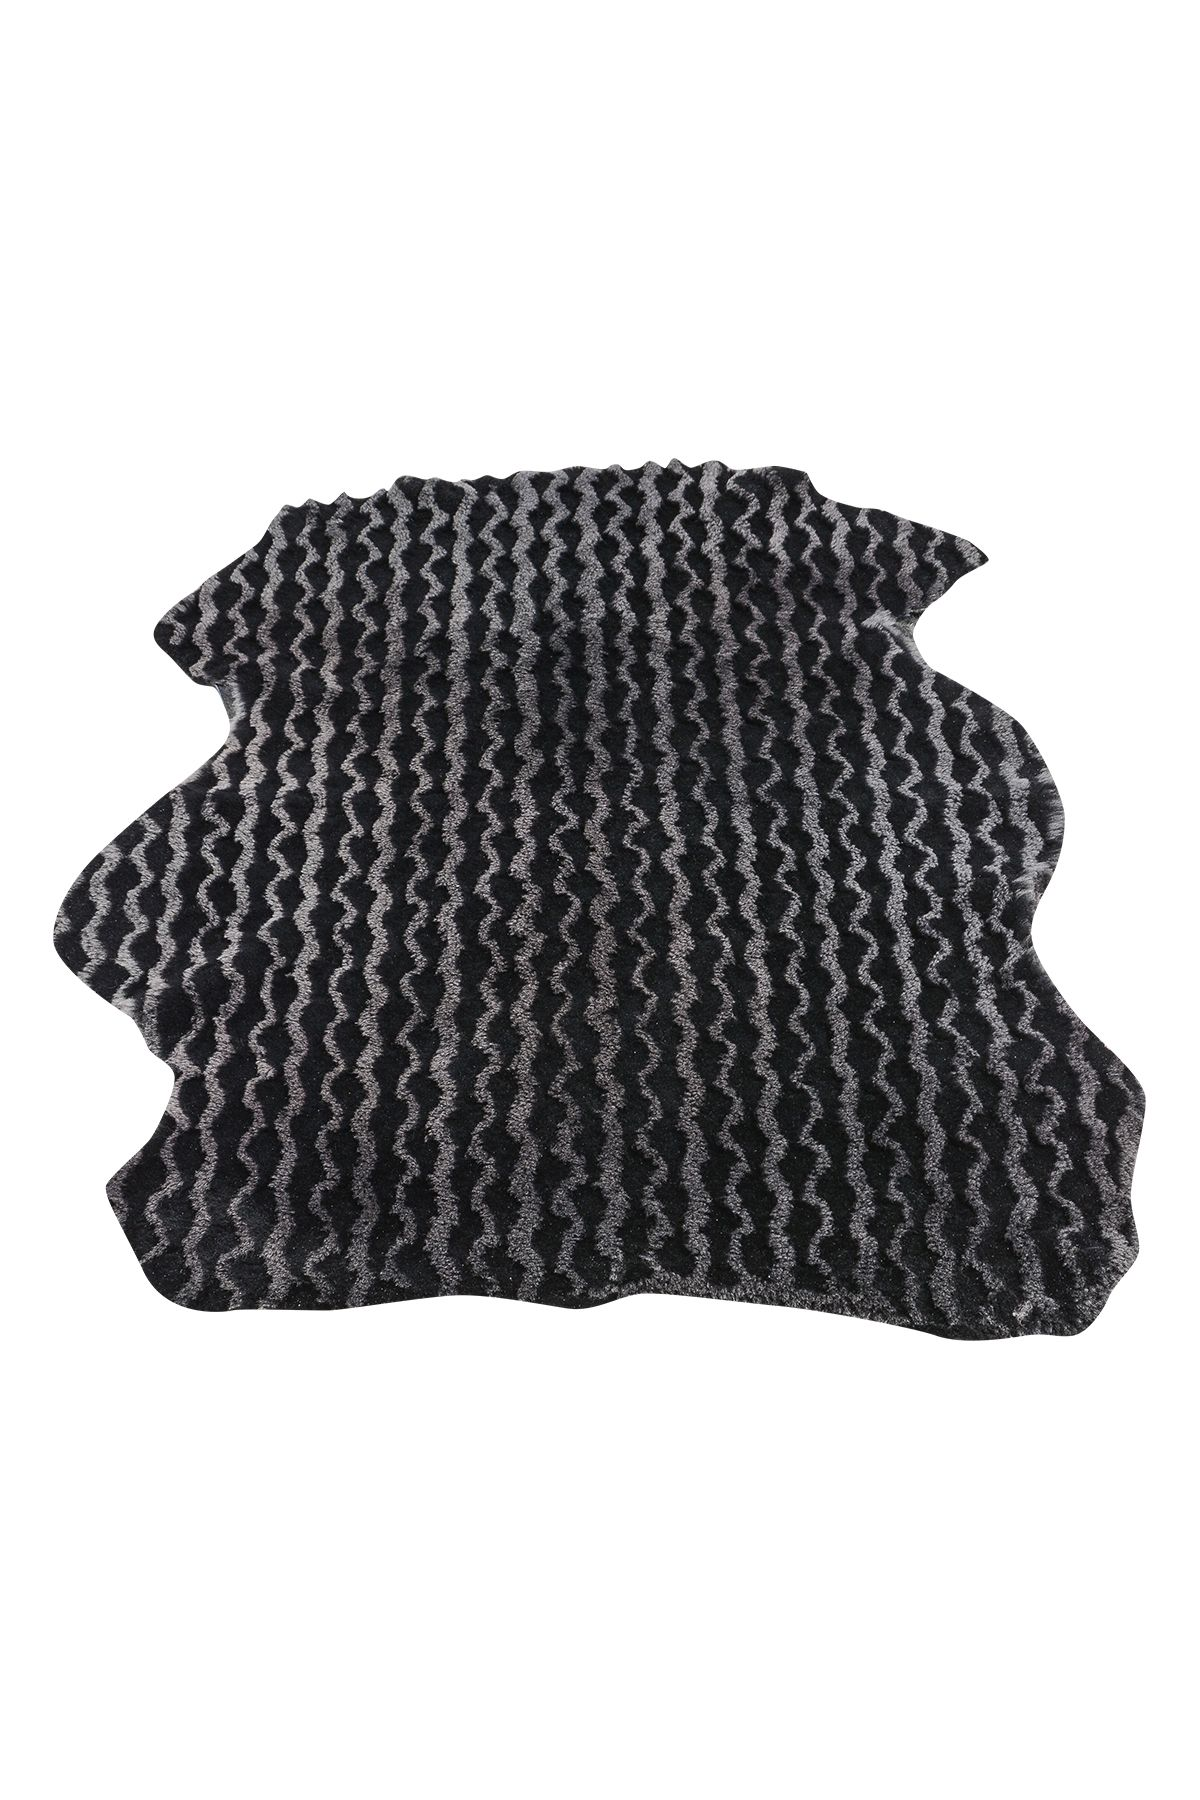 Erdoğan Deri Genuine Leather Natural Embossed Sheepskin Rug DKR060 Black